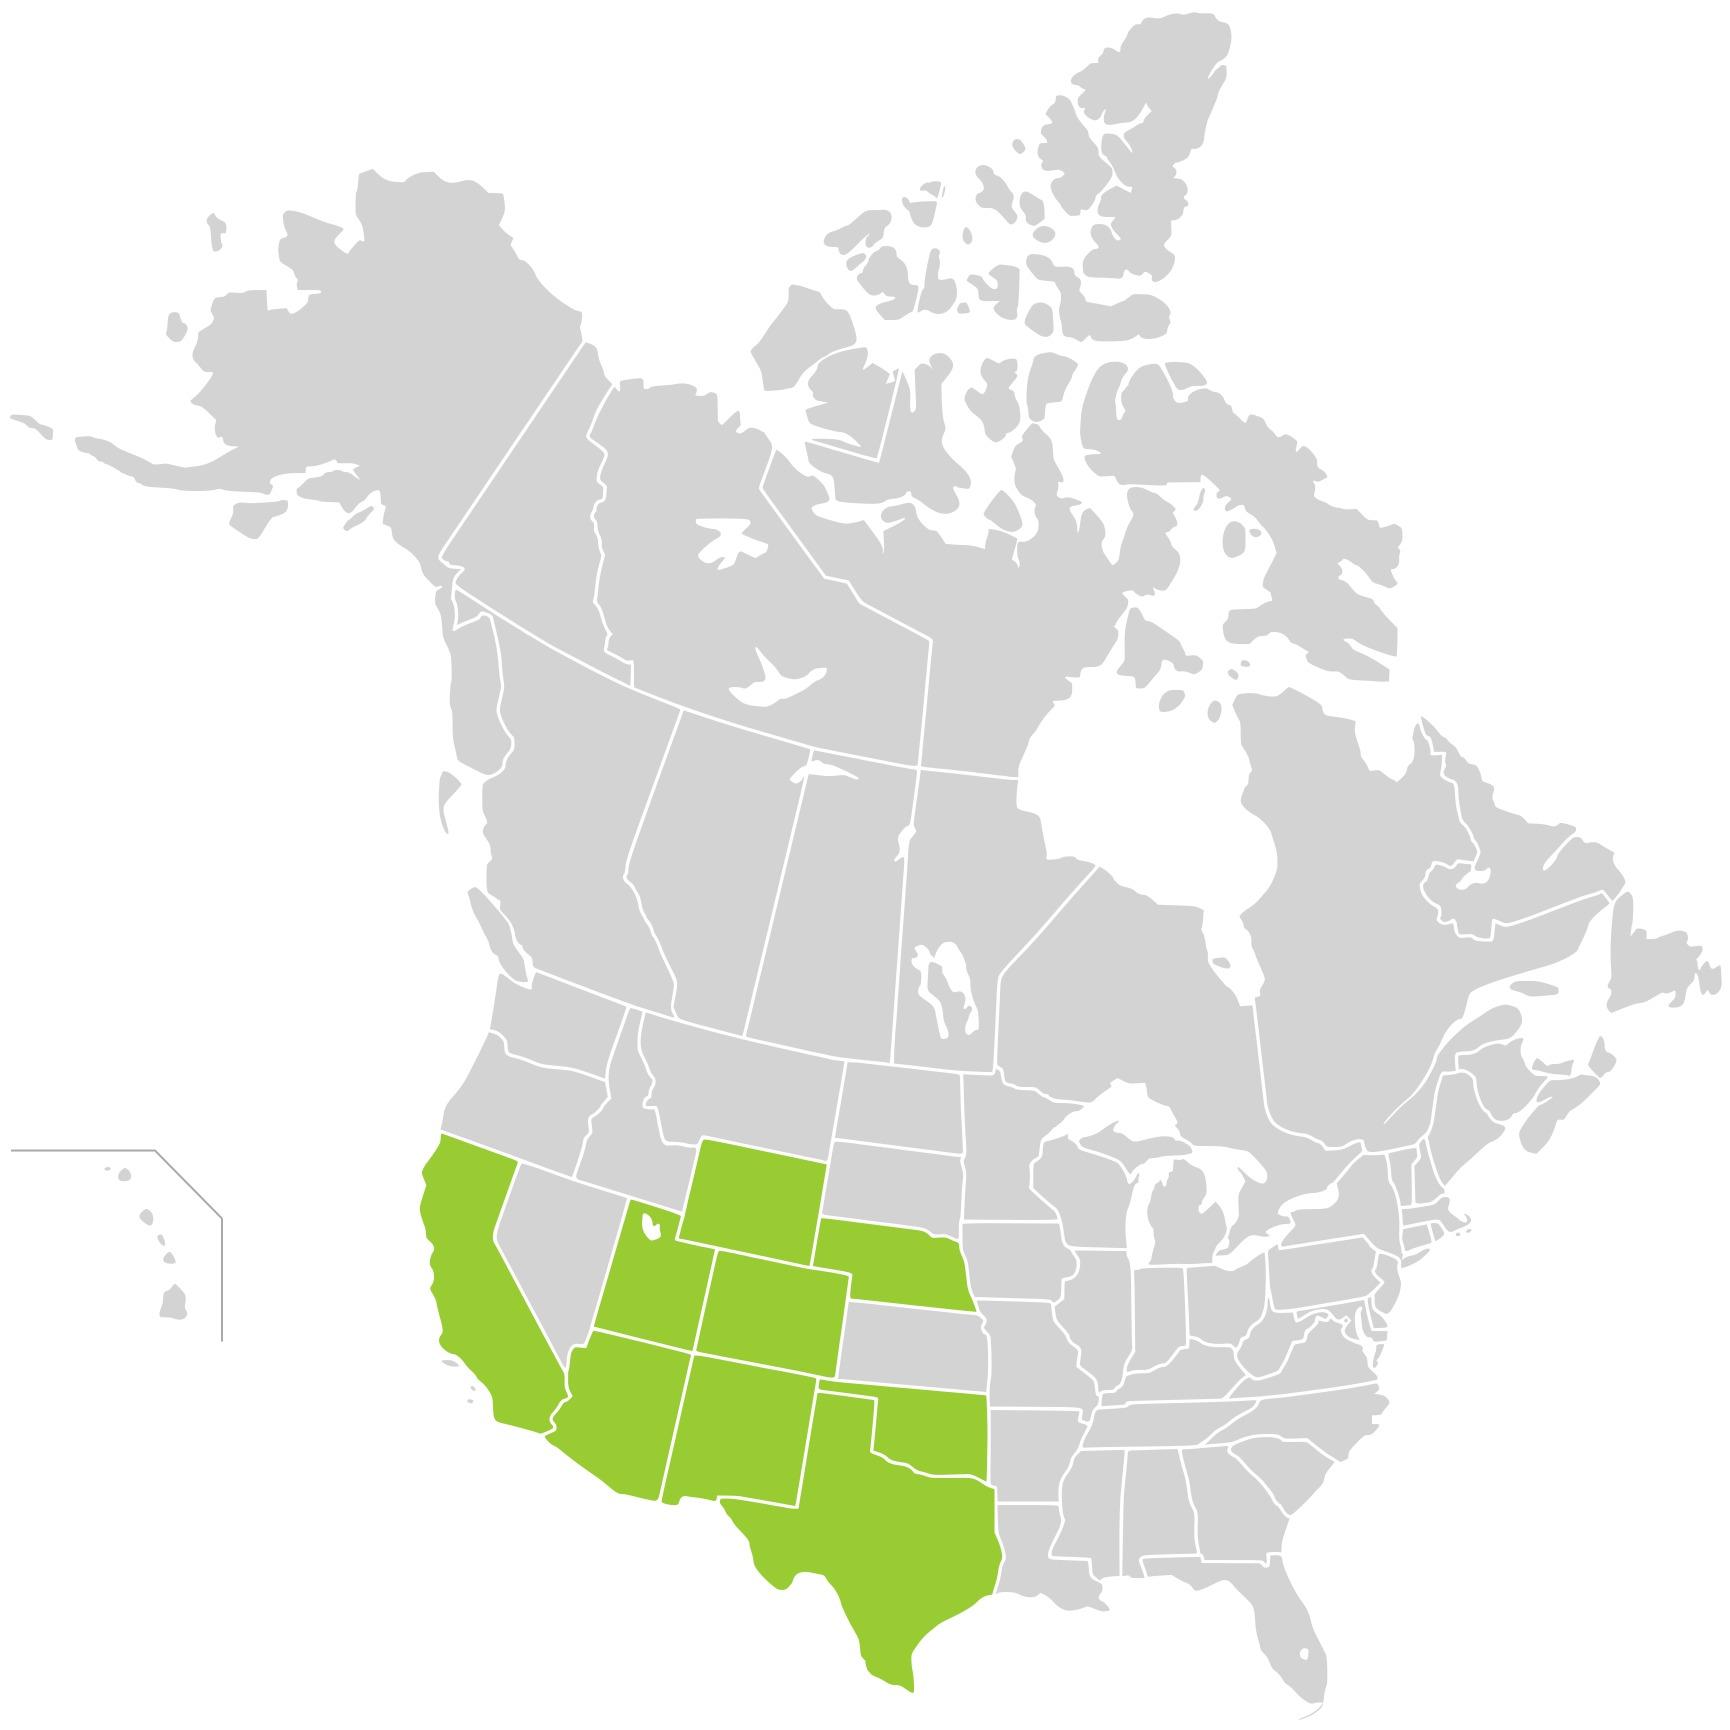 Map of Adonis blazingstar